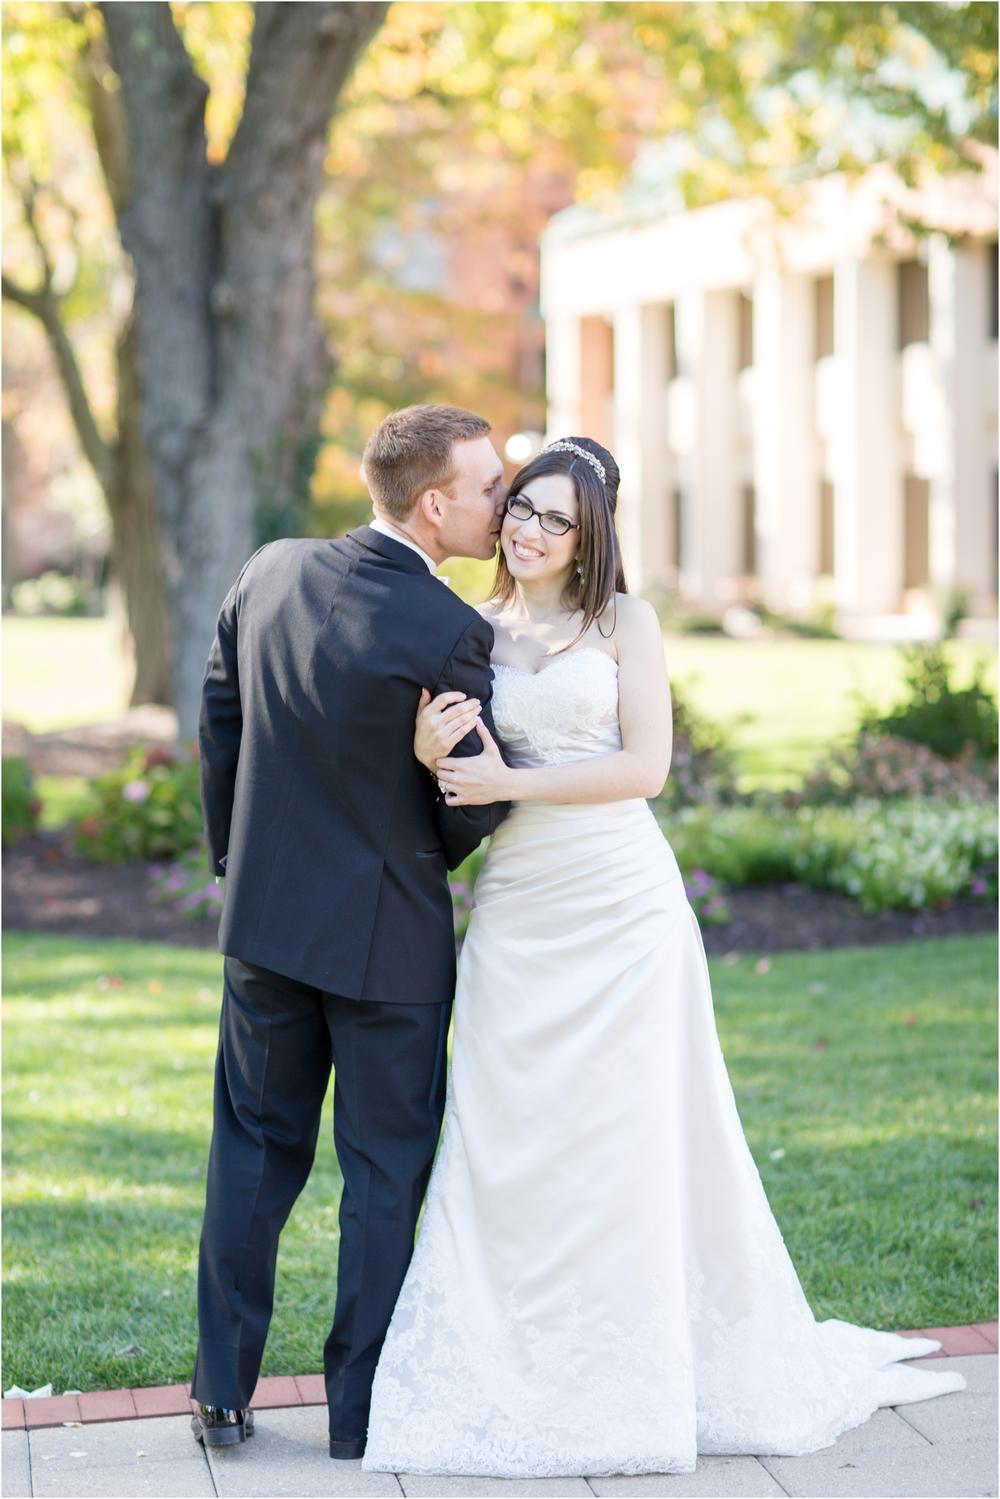 Elhai-Wedding-3-Bride-and-Groom-638.jpg